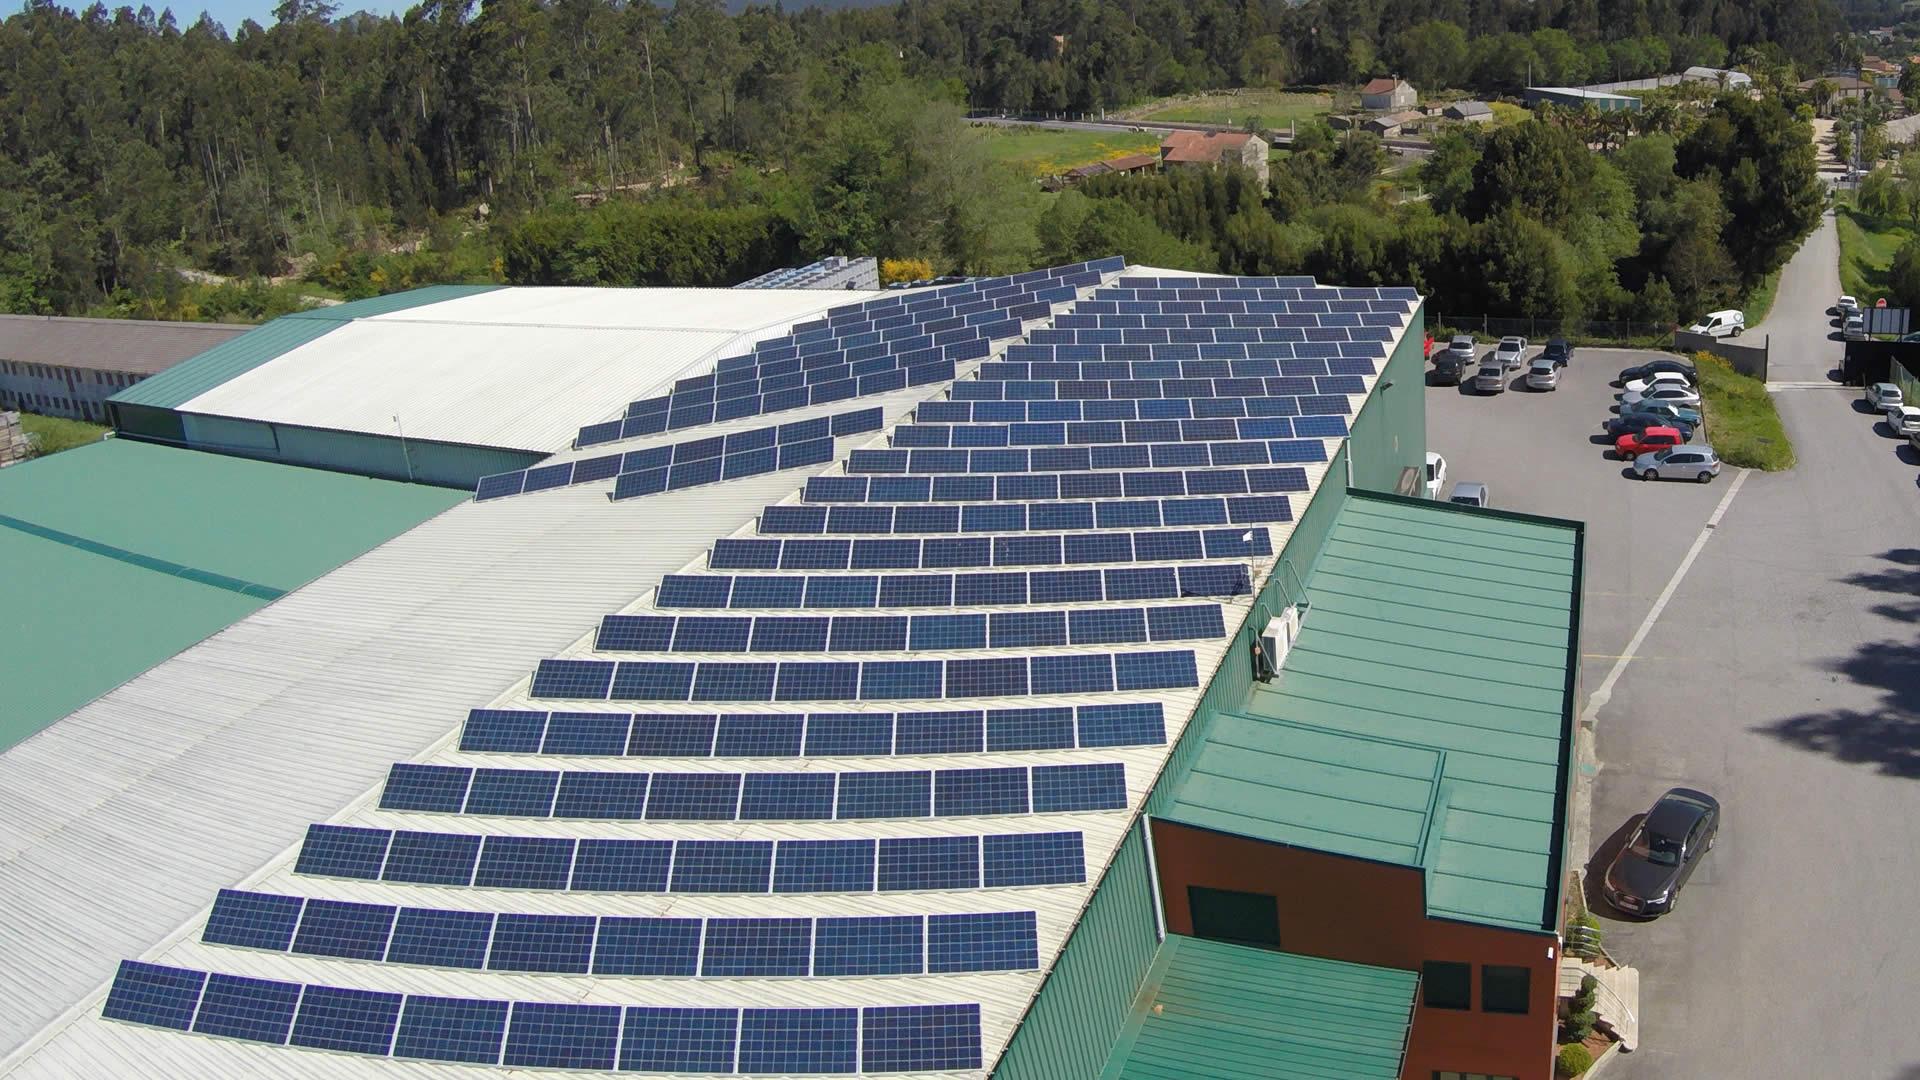 Edf Solar Energia Solar Fotovoltaica Kiwi Atlantico Pontevedra 03